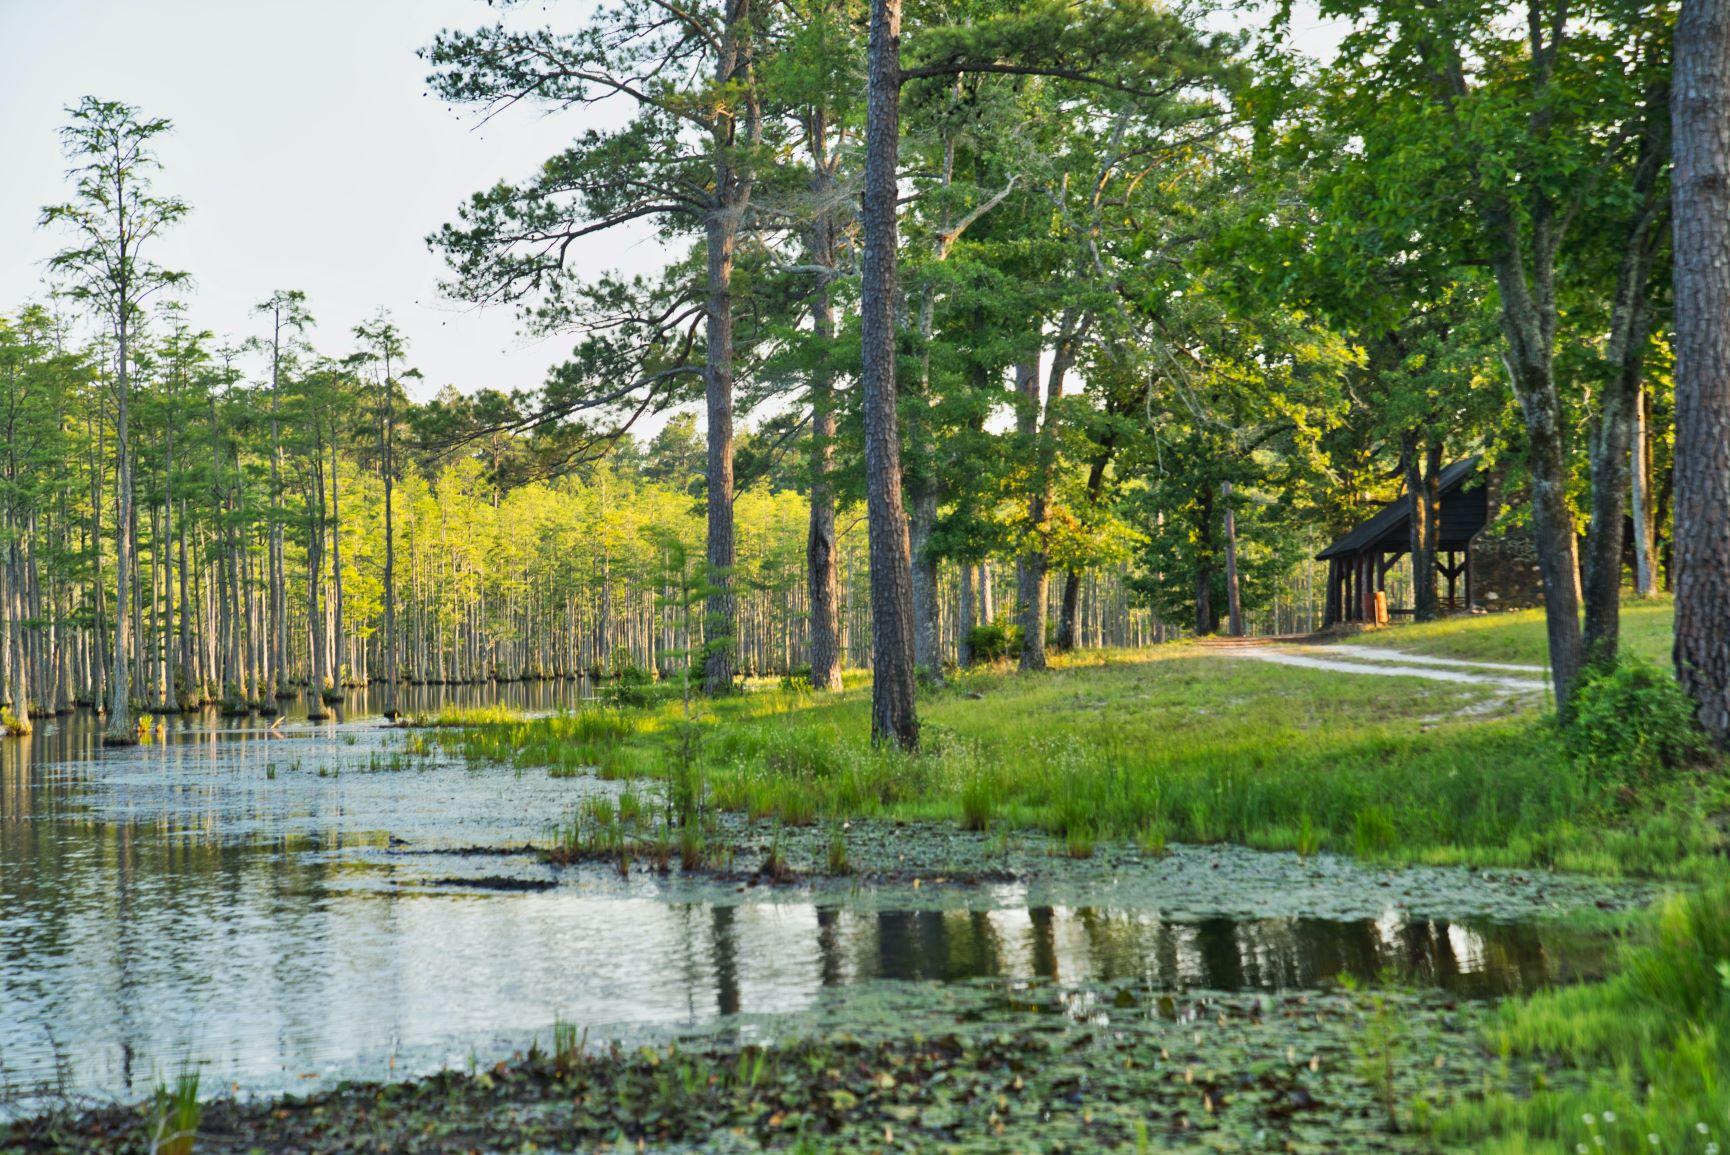 Carvers Creek State Park